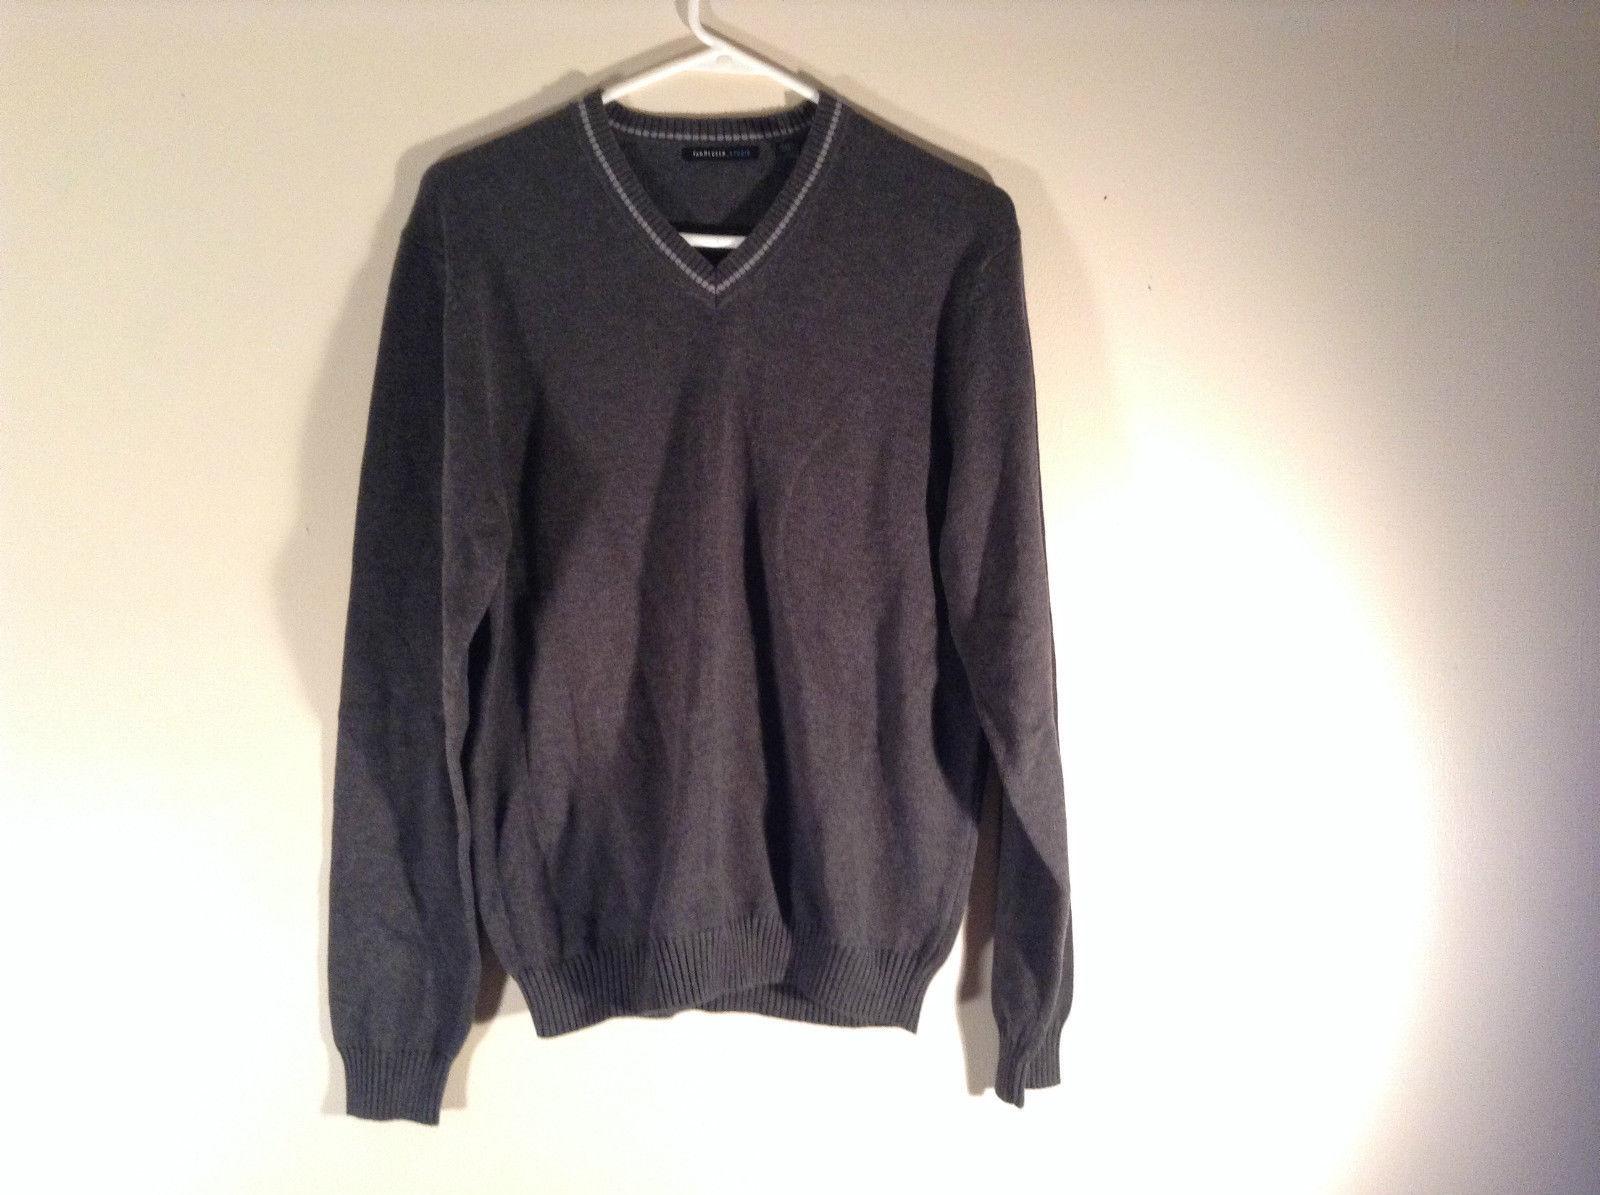 Van Heusen Dark Gray Light V Neck Sweater Size Small Petite 100 Percent Cotton